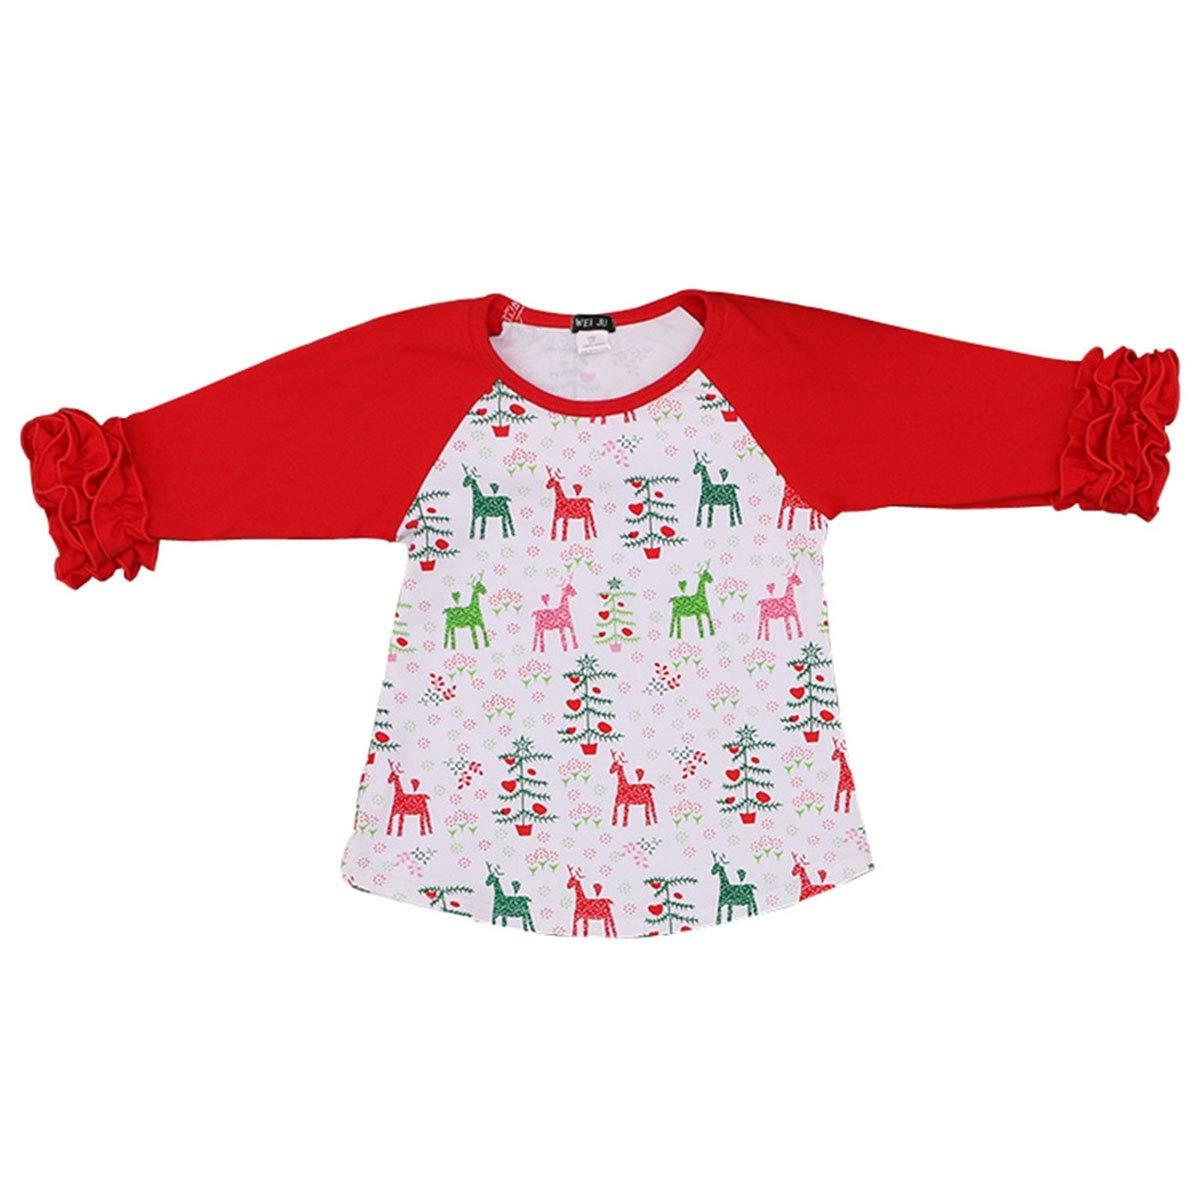 9356c15fd Amazon.com: WEIJU 2-5 Years Baby Girls Child 100% Cotton Scoop Neck Lace Long  Sleeve Tee Shirts: Clothing